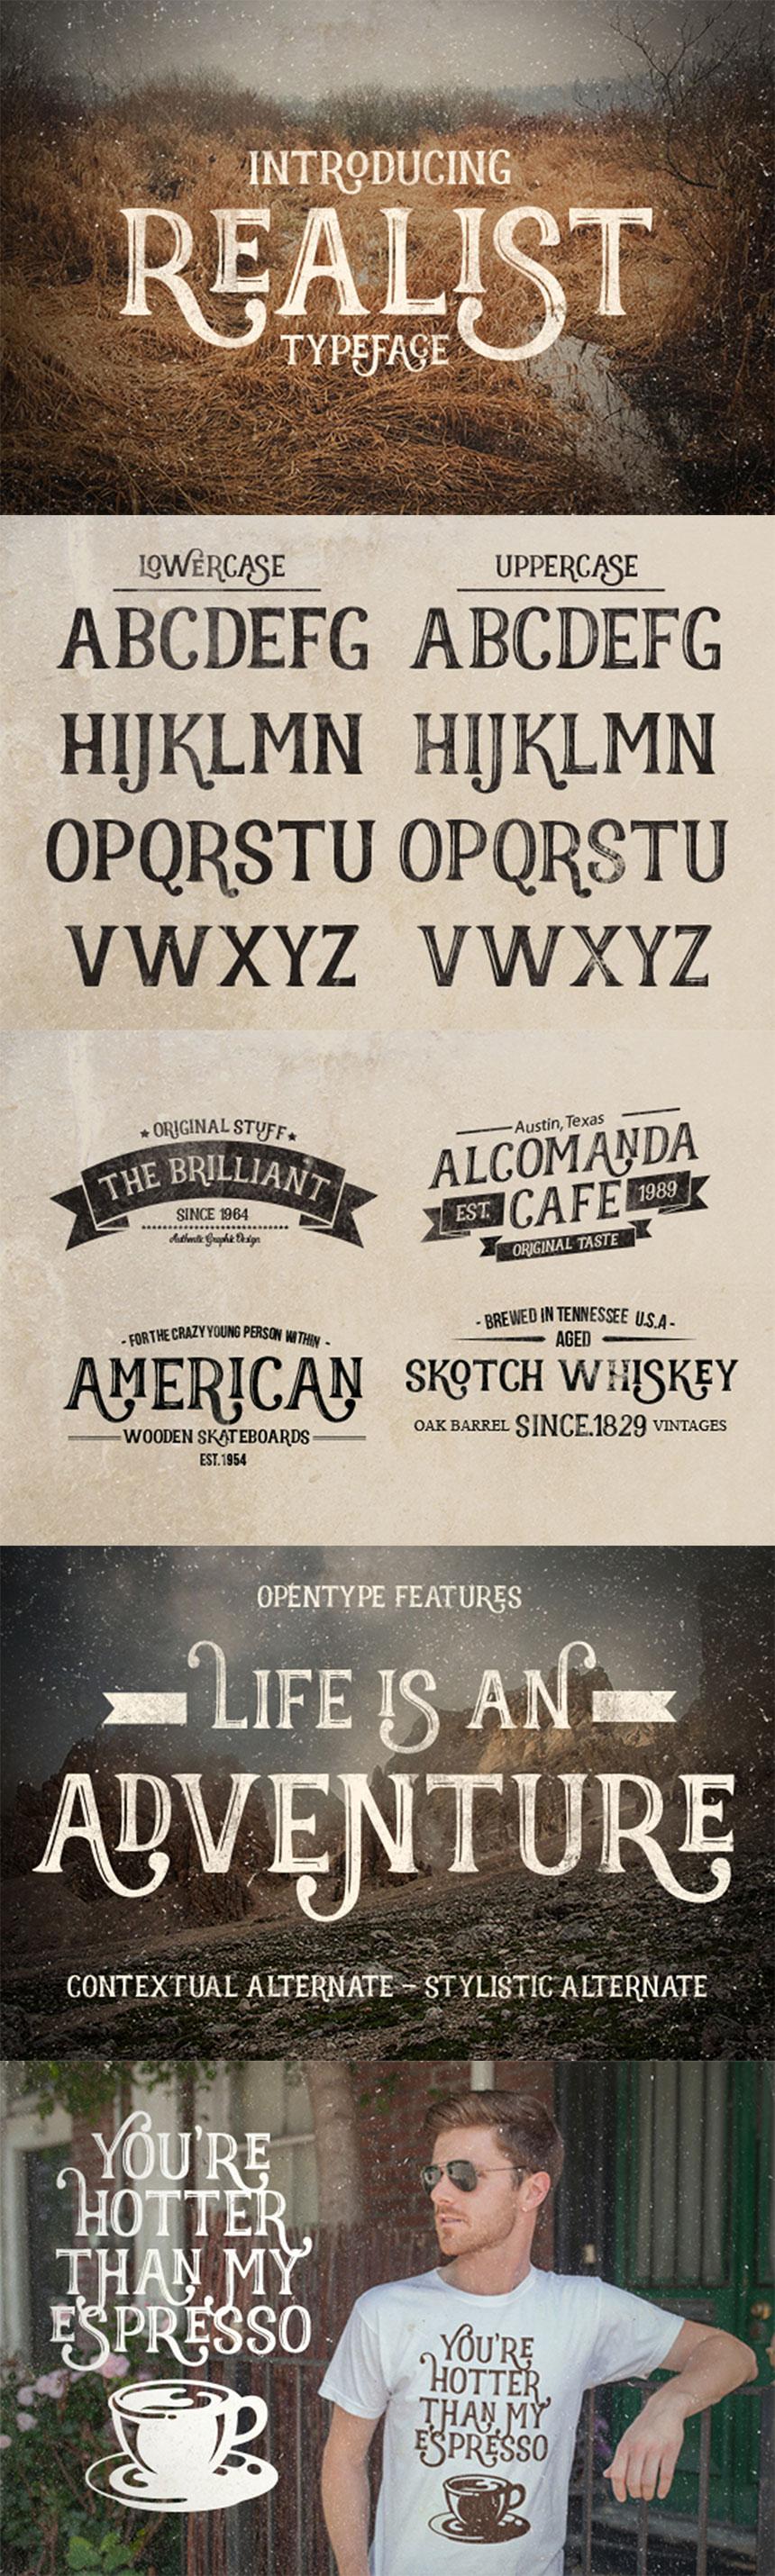 The Freakishly Huge Bundle of 40 Fonts and Bonus Vectors (Plus Web Fonts &  Extended Licensing) - Only $39